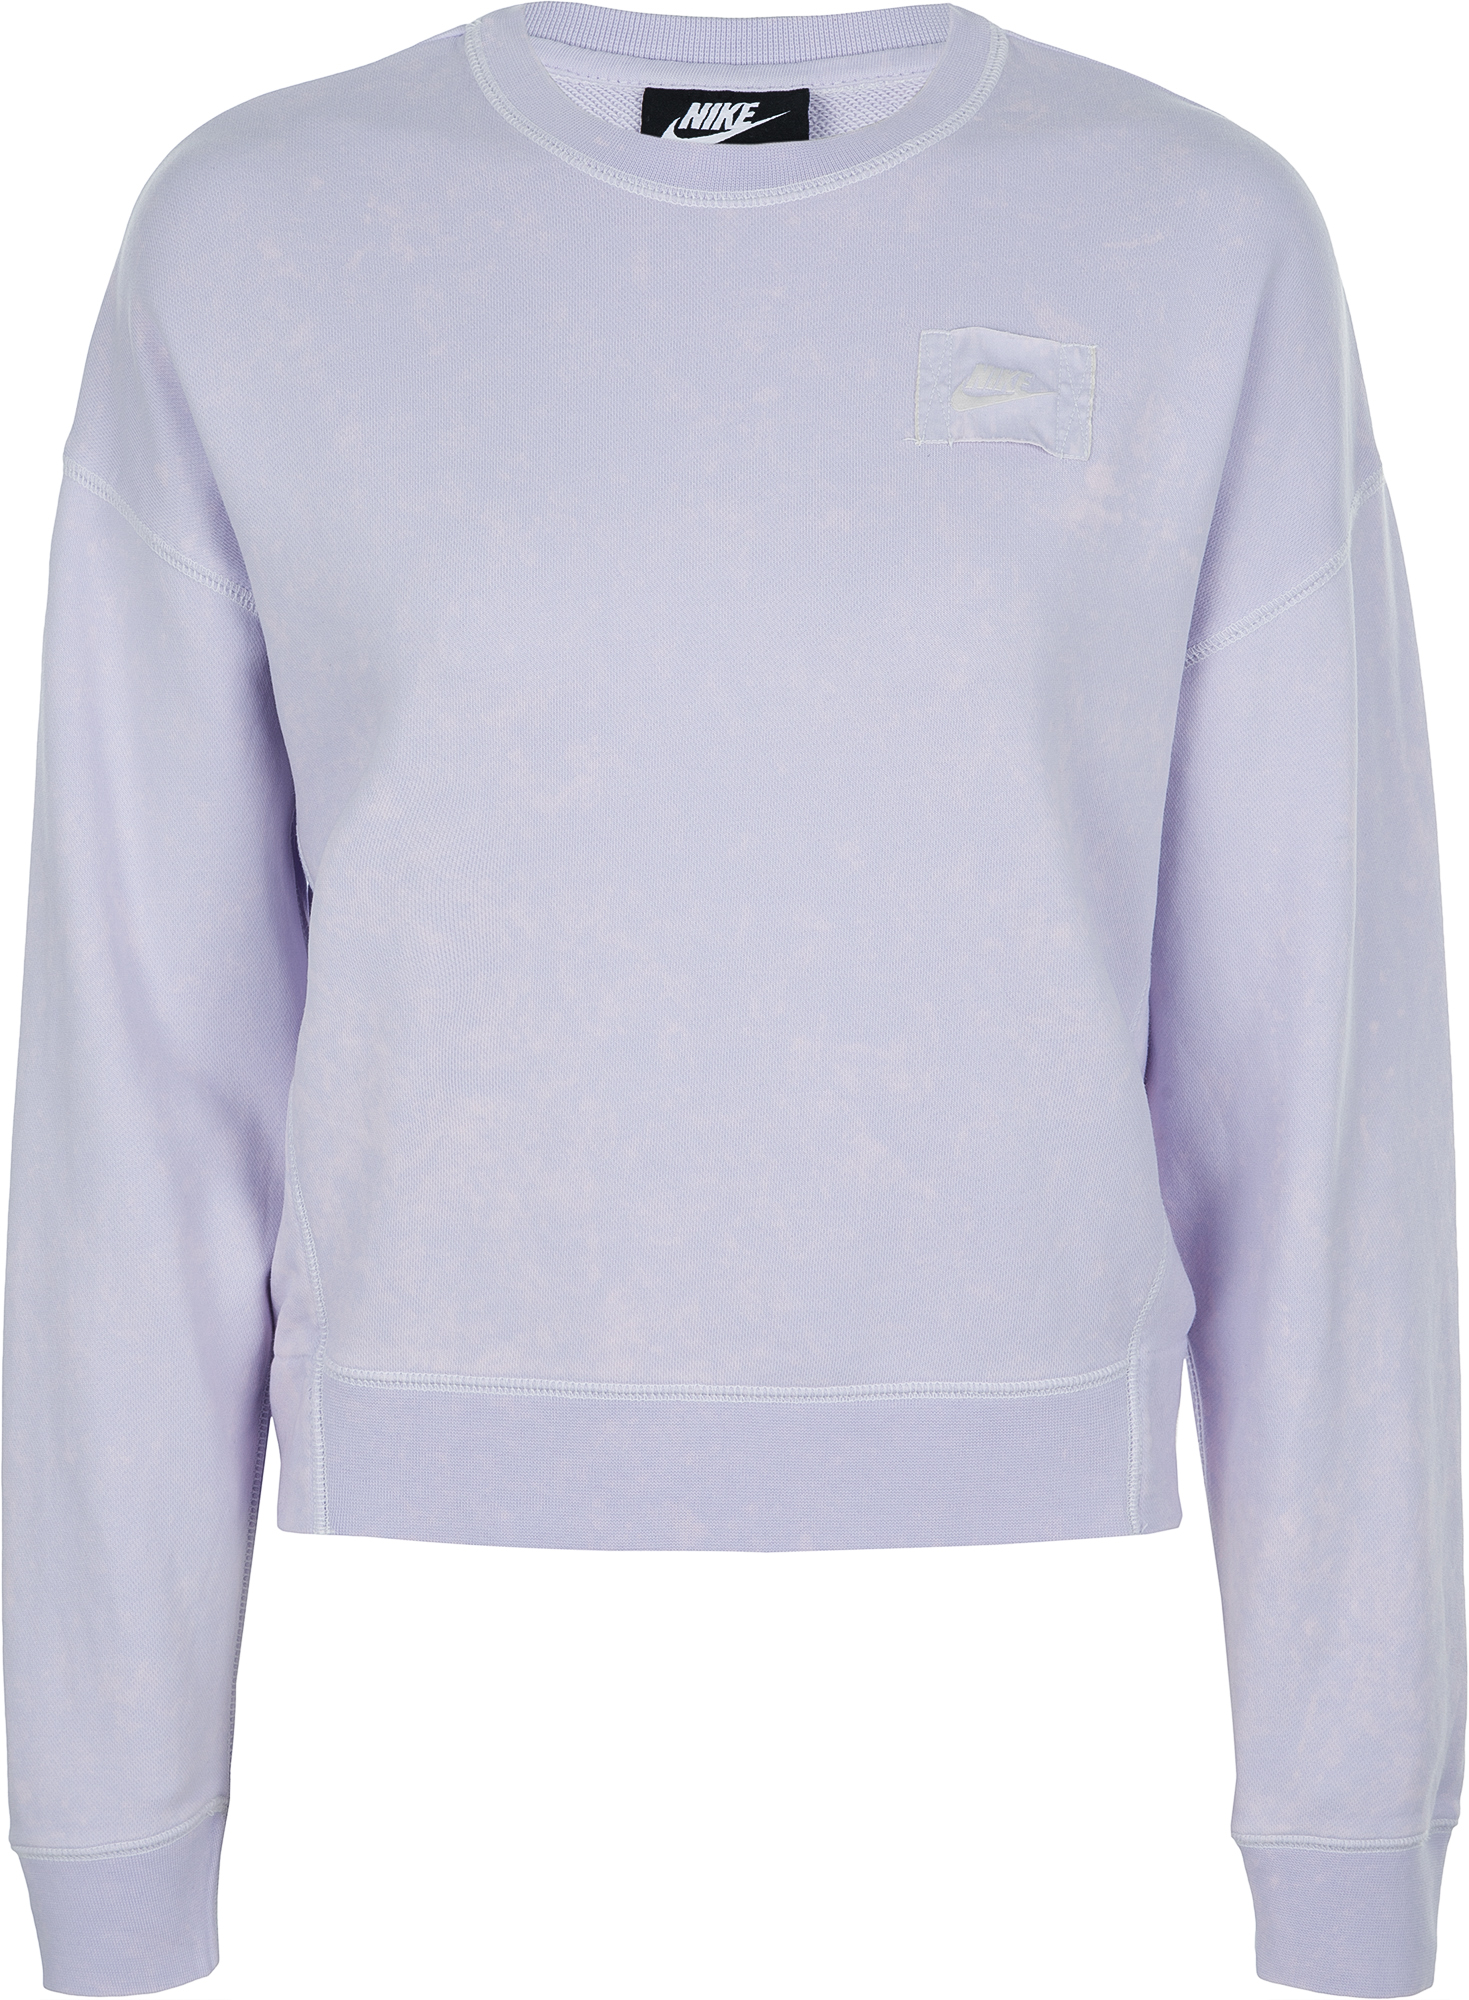 цена Nike Свитшот женский Nike Crew Rebel, размер 40-42